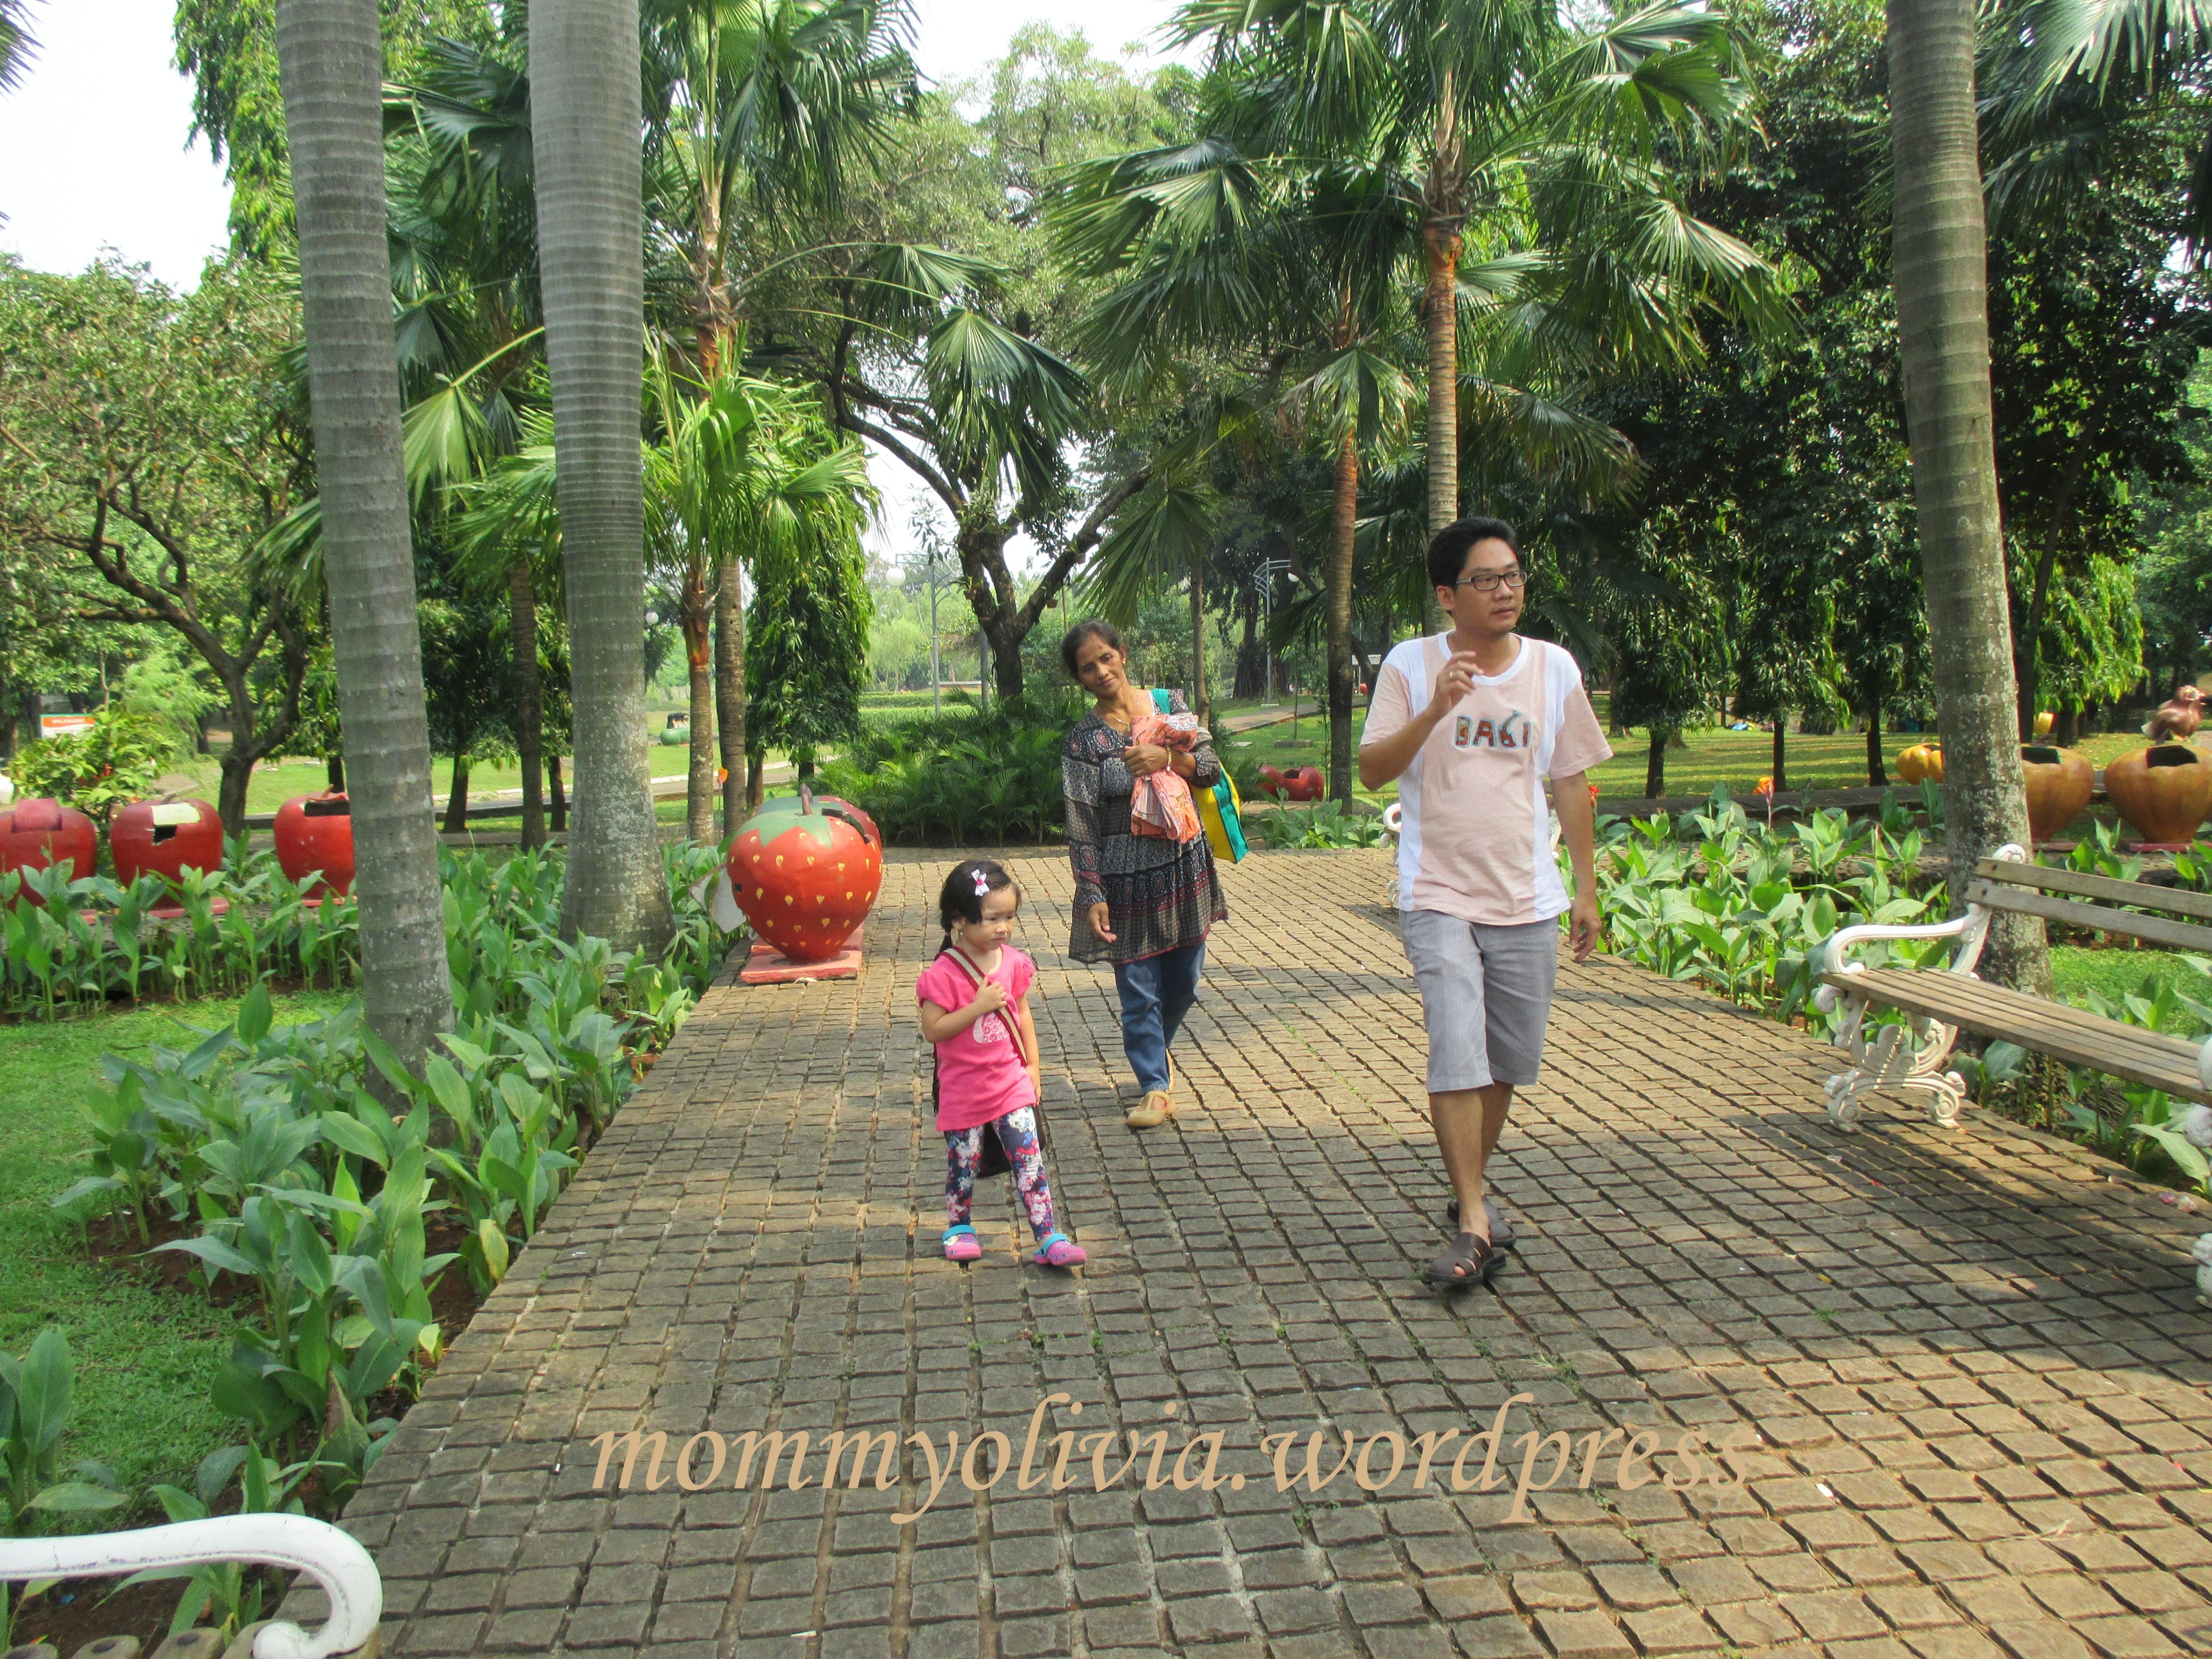 Piknik Taman Cattleya Tomang Simple Note Jalan Hutan Kota Srengseng